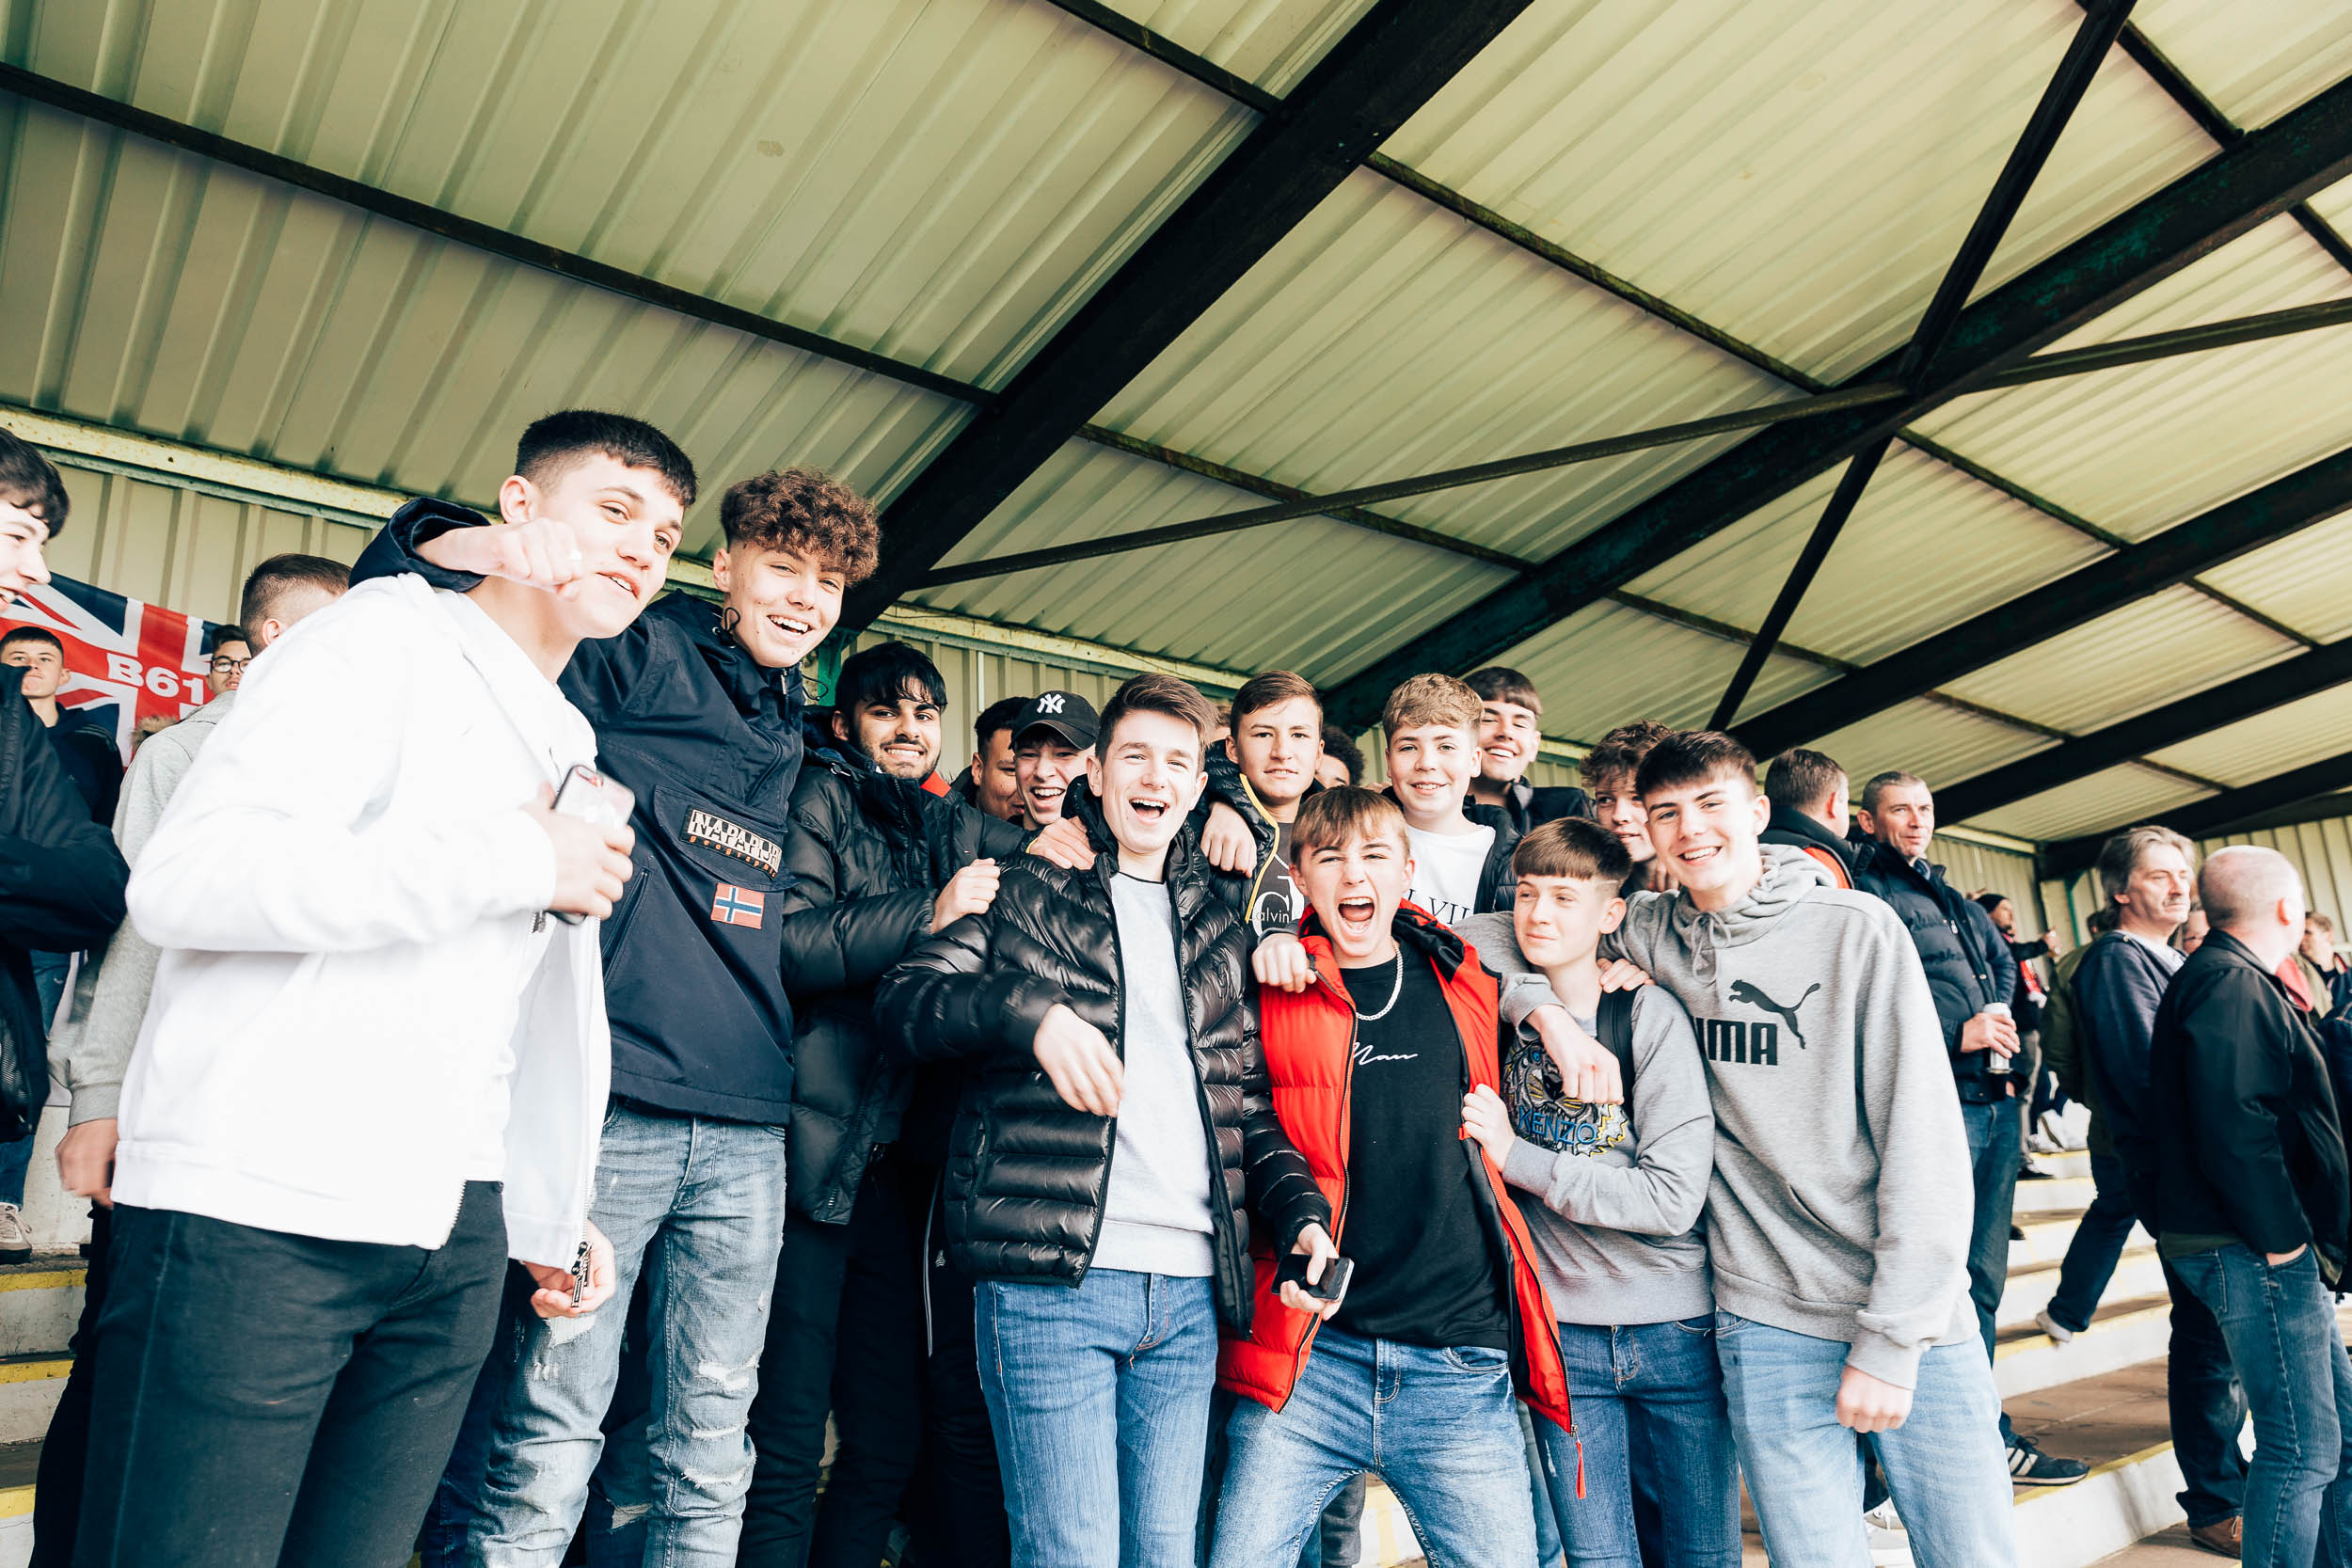 06_05_2019_Bromsgrove_Sporting_Corby-28.jpg